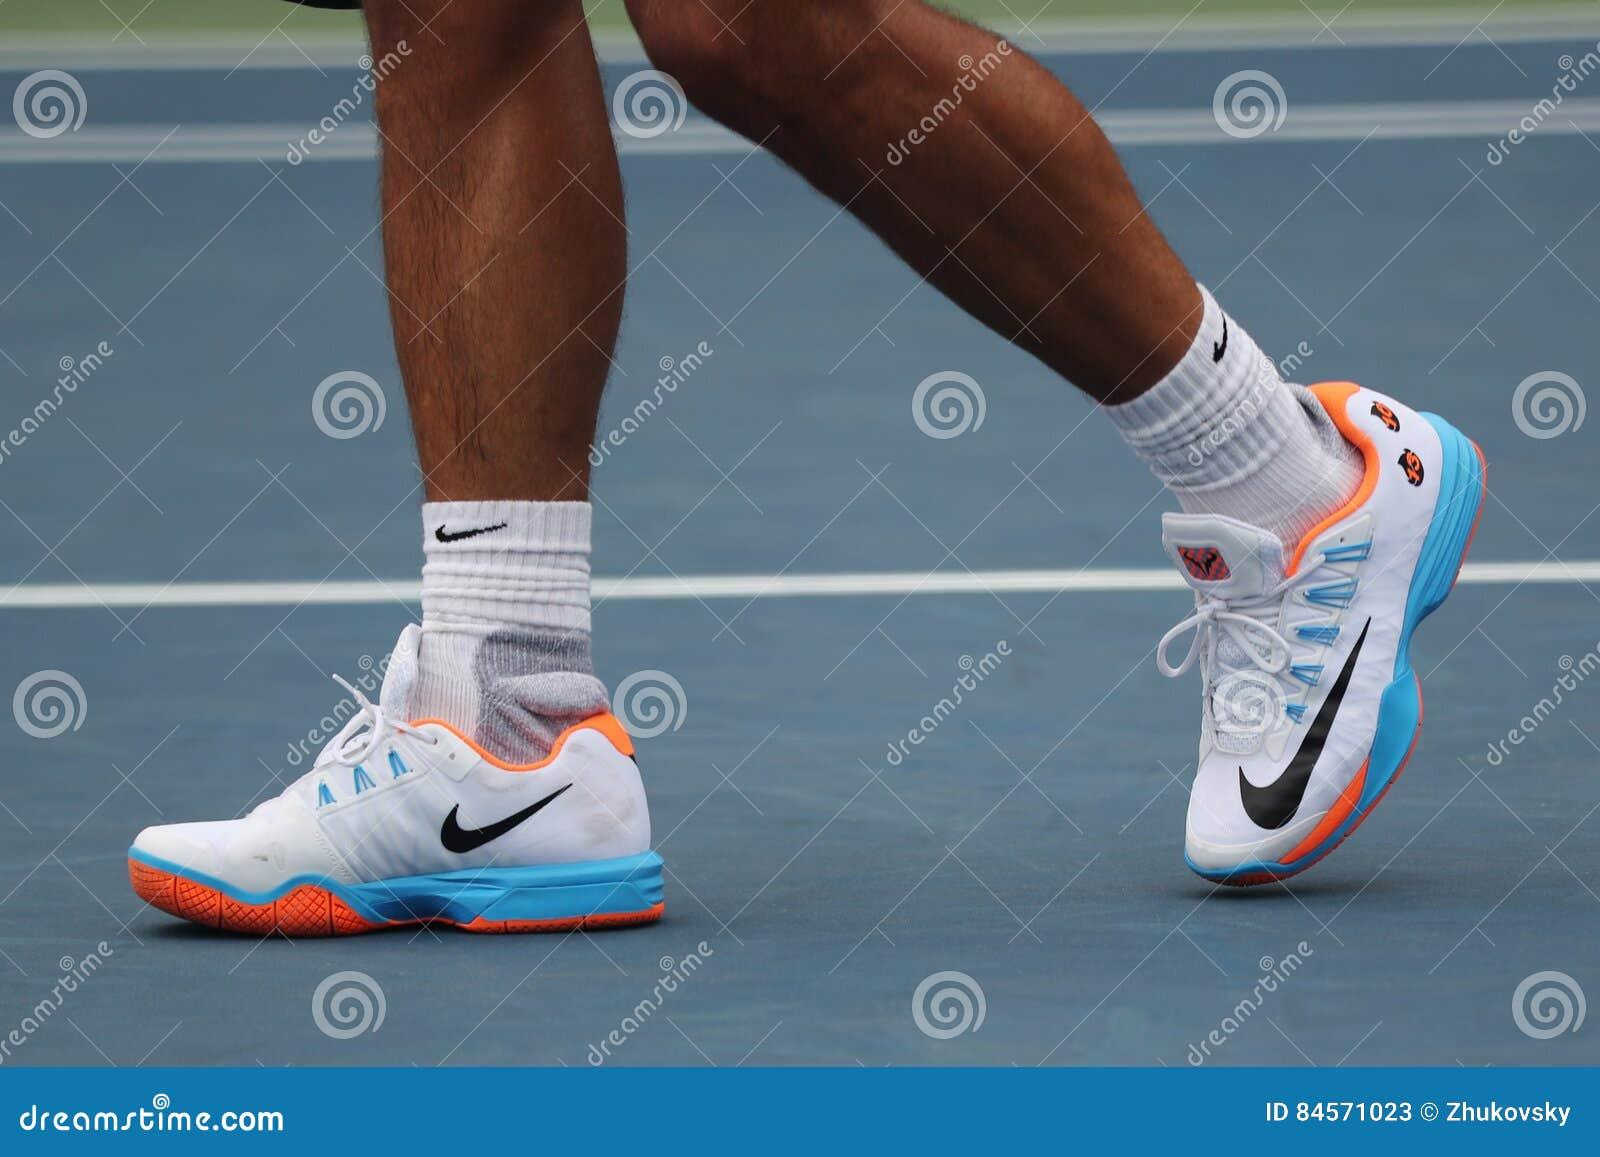 285c11fd8fd Grand Slam Champion Rafael Nadal Of Spain Wears Custom Nike Tennis ...